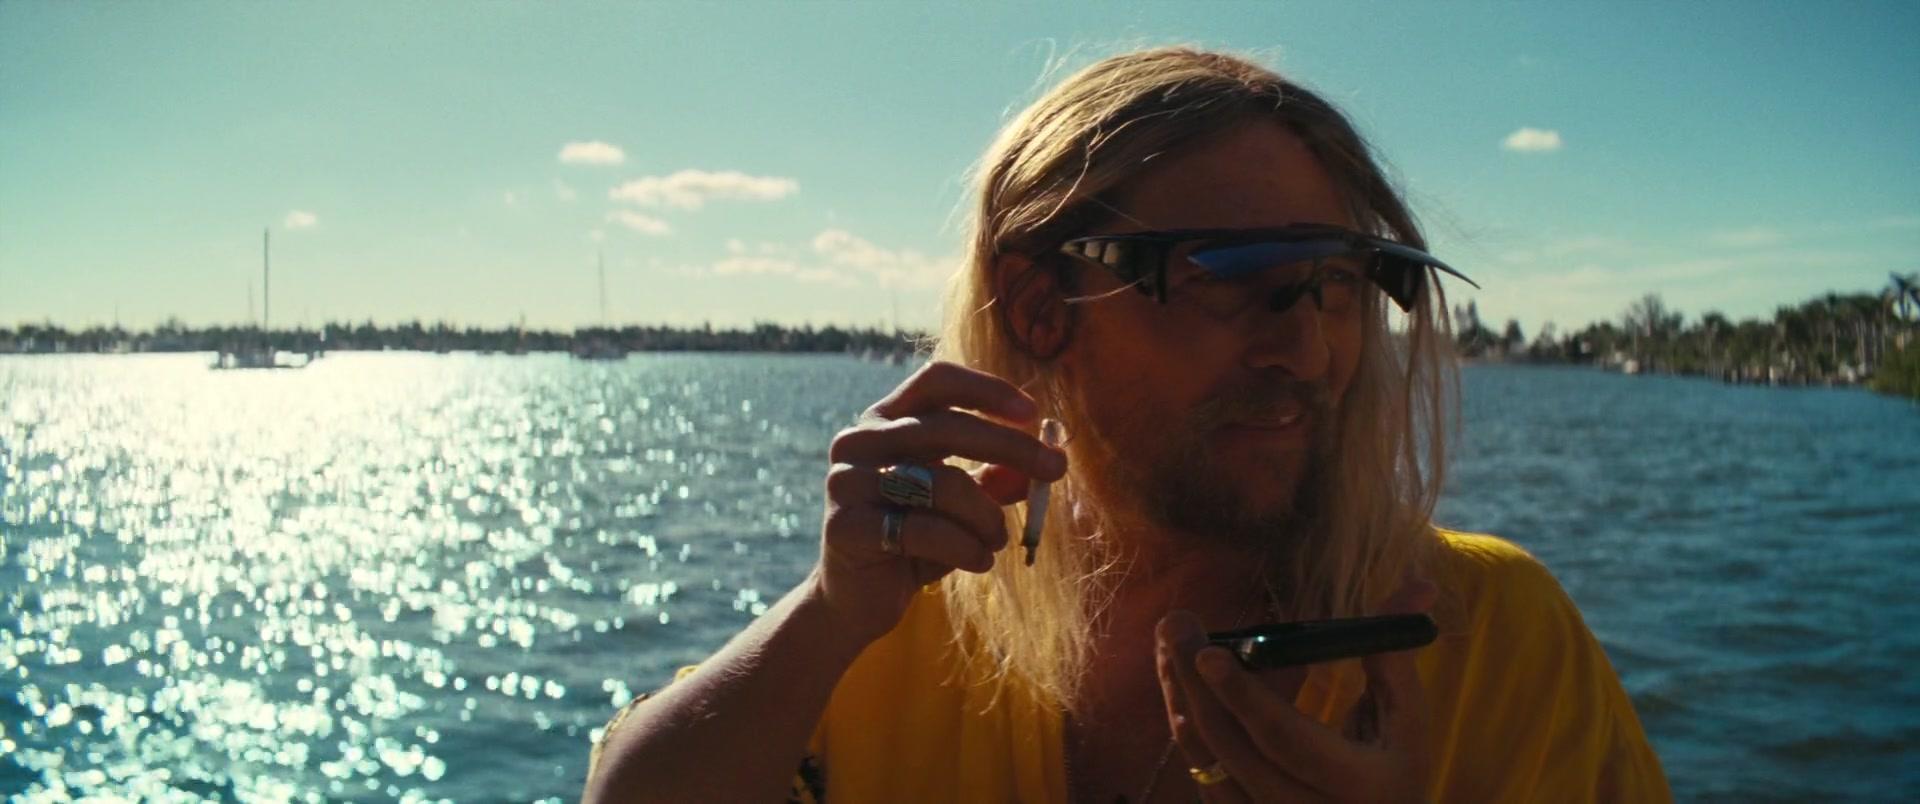 Aloha Eyewear Sunglasses Flip Up Cover Up By Matthew